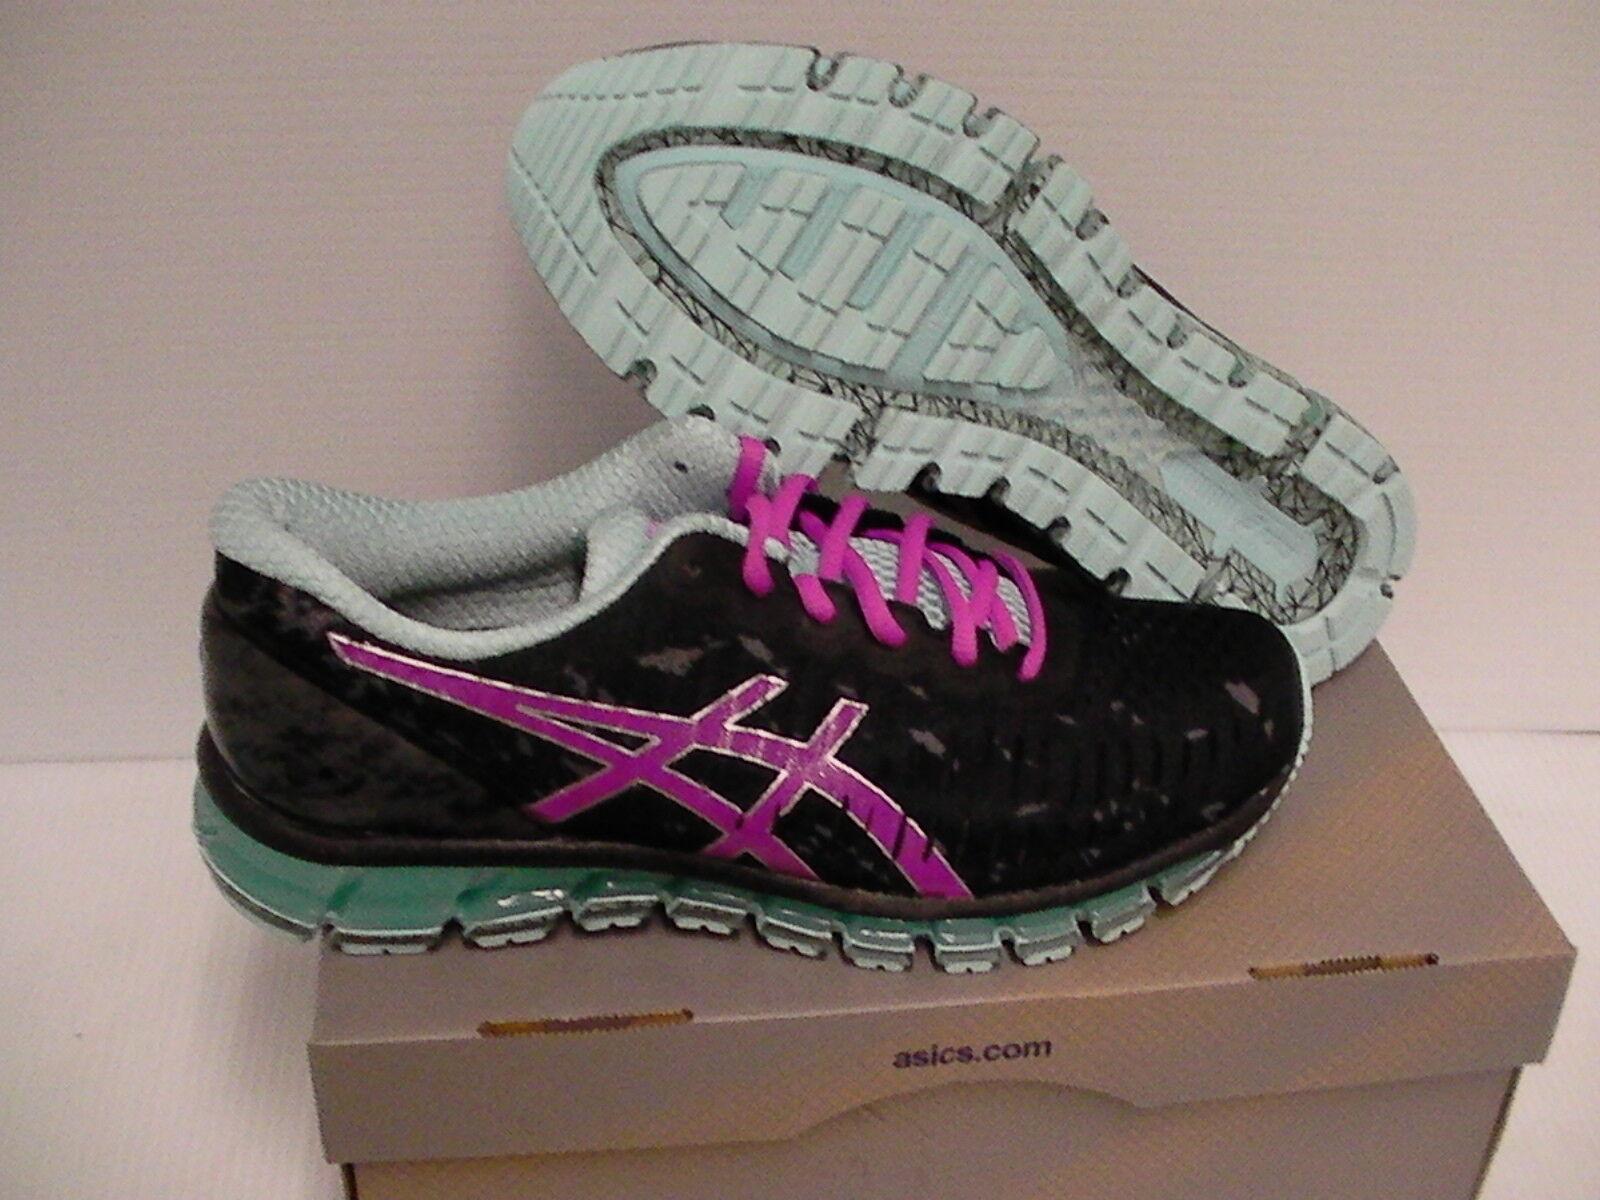 Women's Asics running shoes gel quantum 360 black pink glow size 11.5 us new